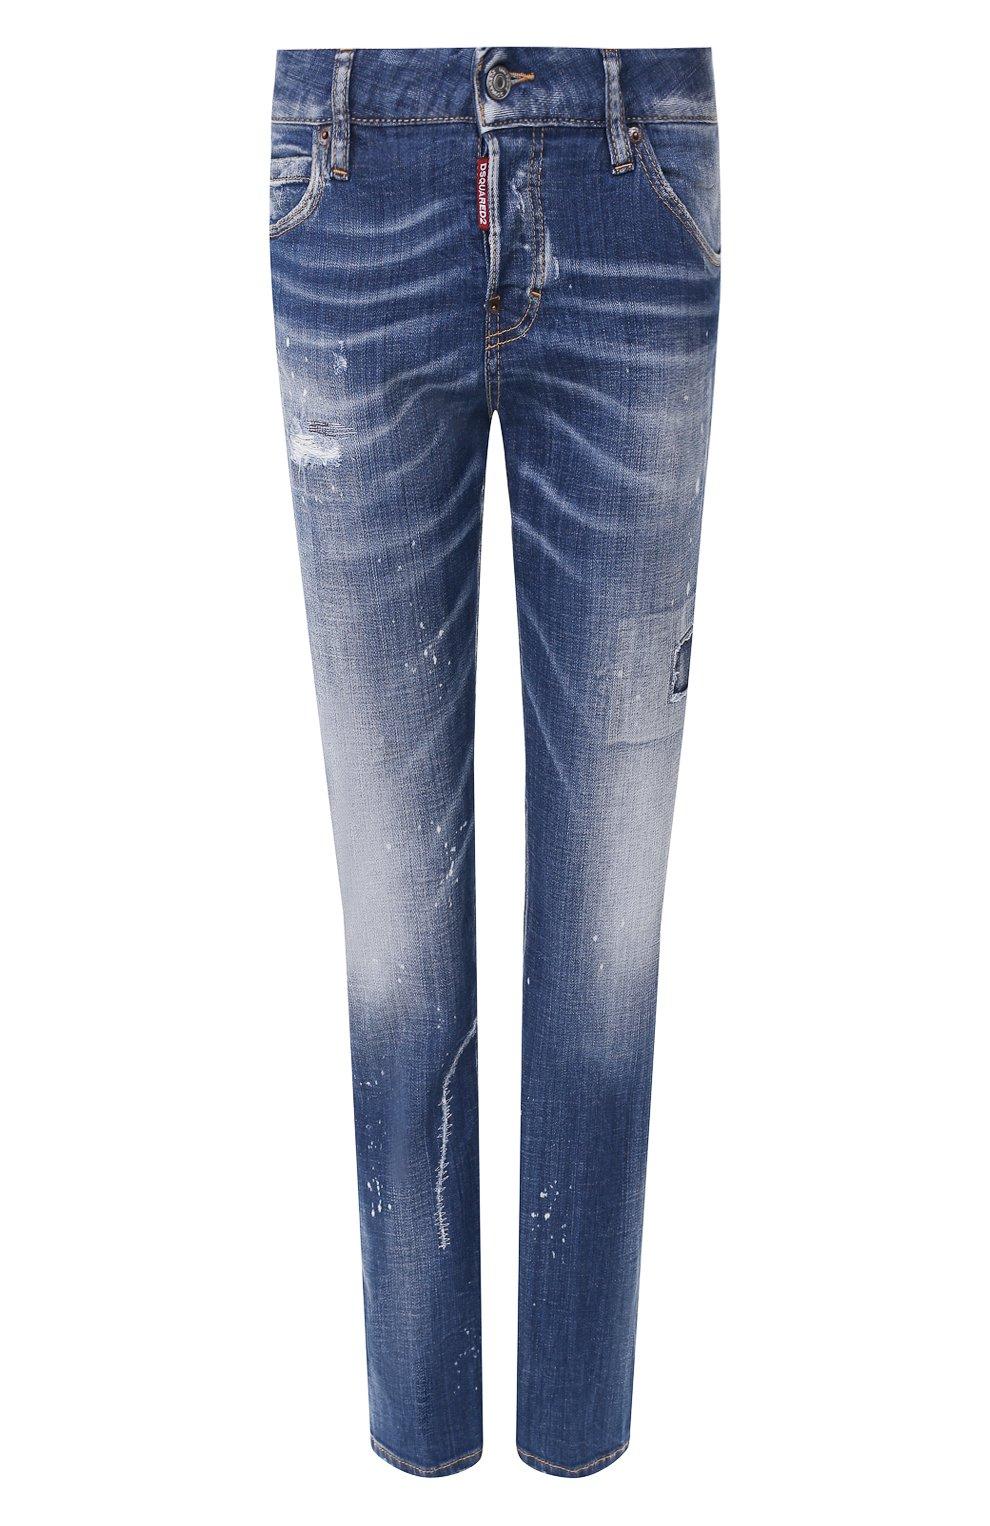 Женские джинсы DSQUARED2 синего цвета, арт. S75LB0281/S30342 | Фото 1